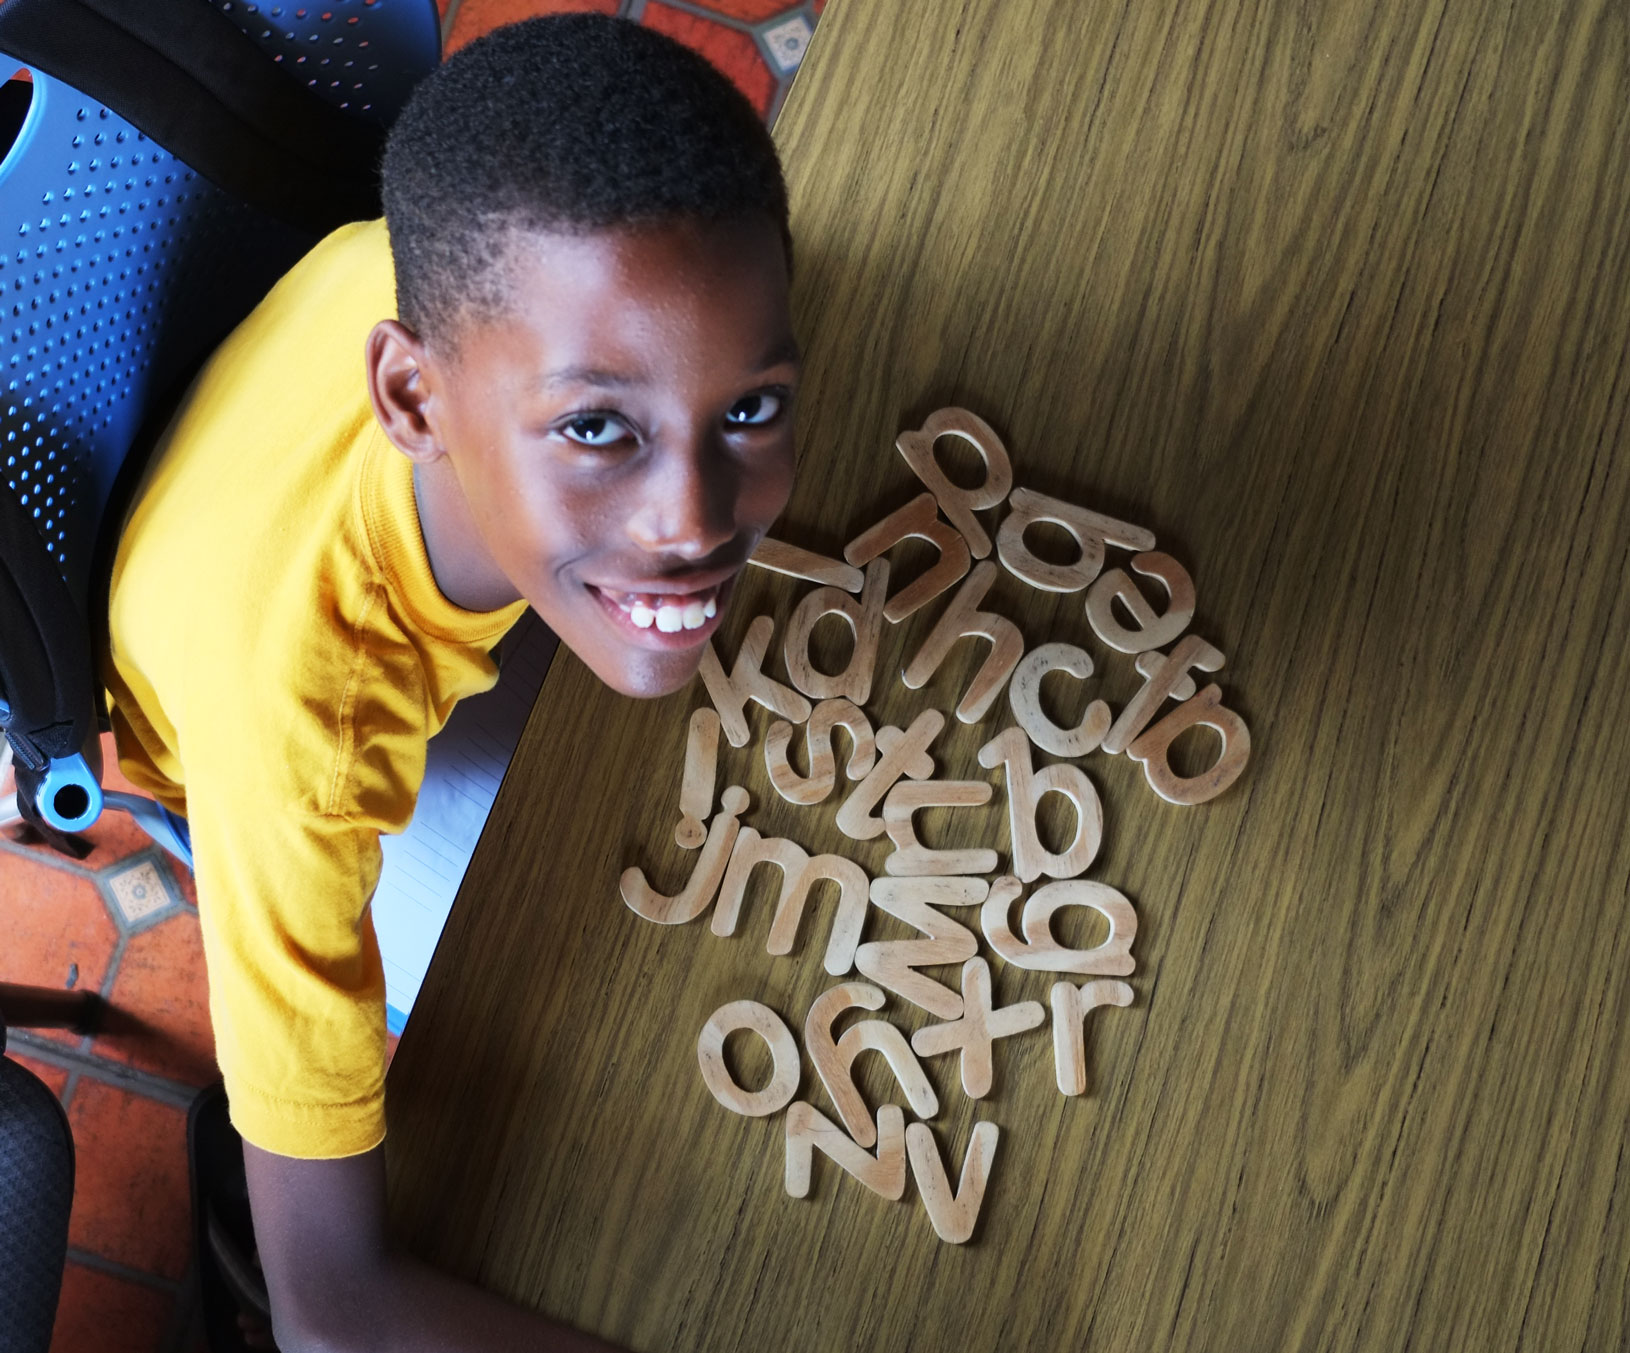 caribbean-dyslexia-1.jpg